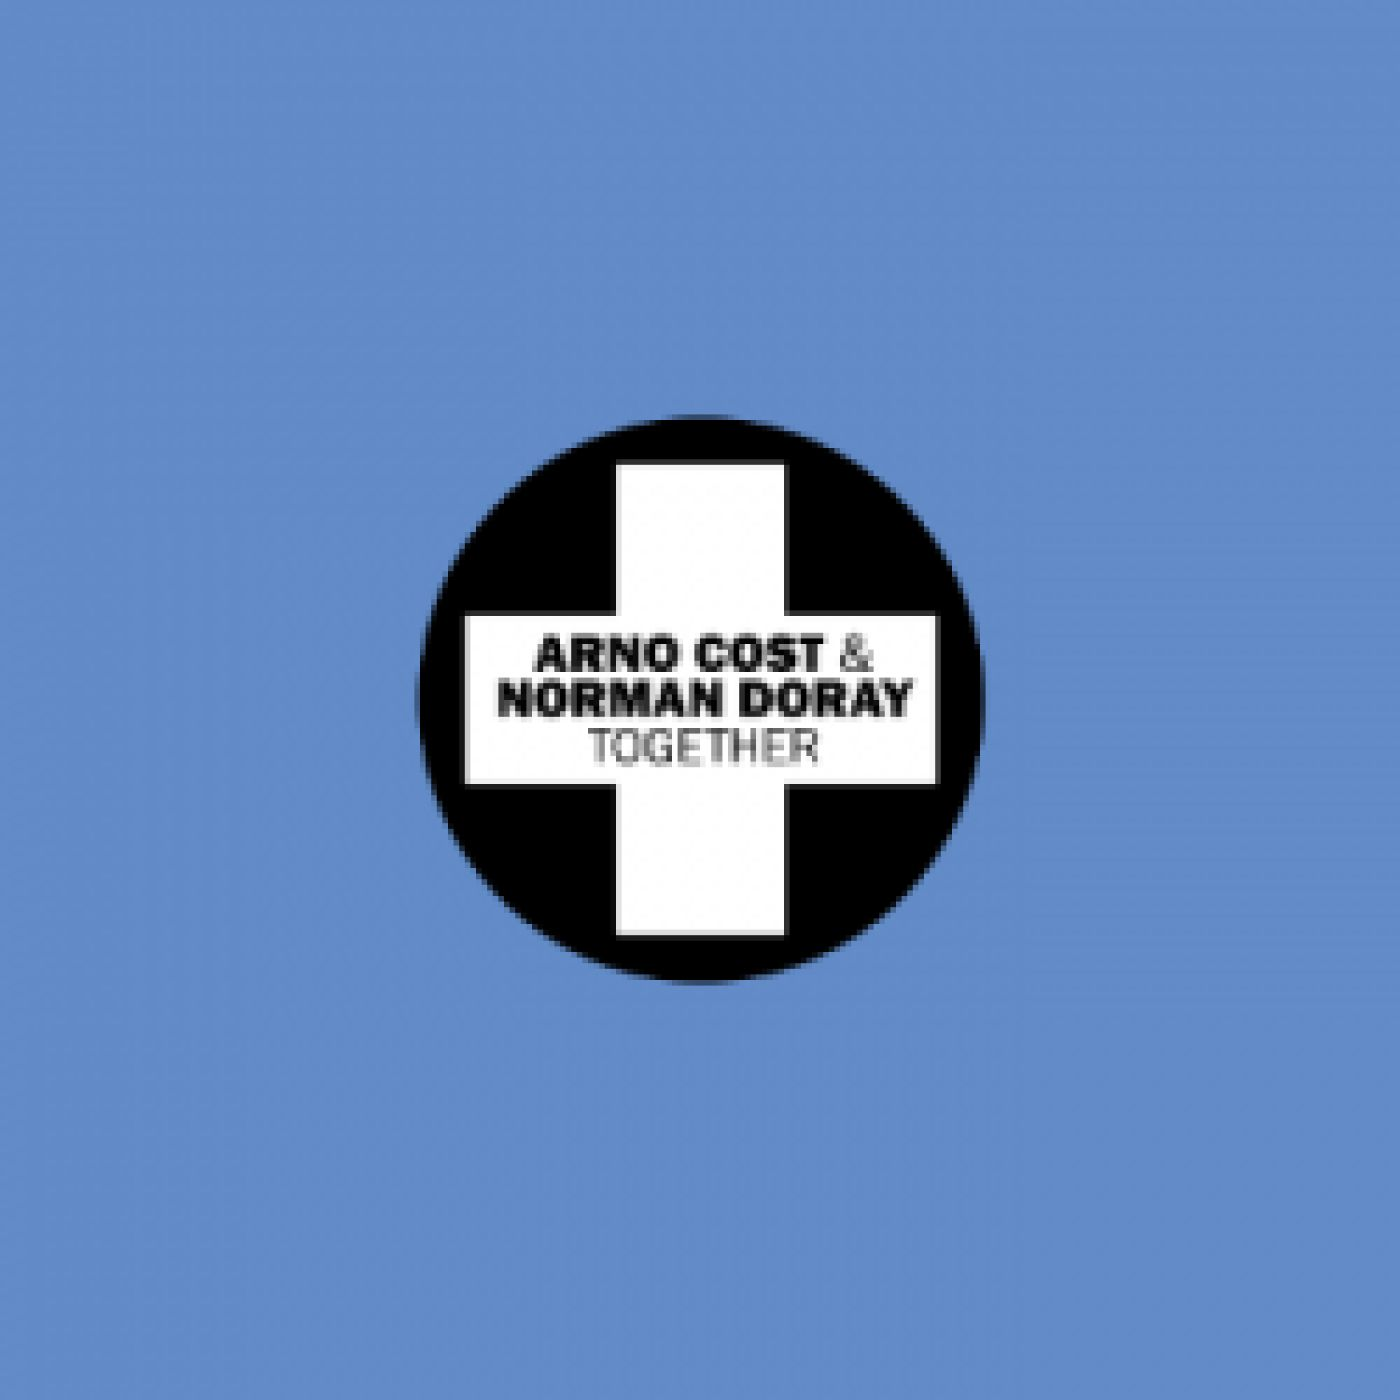 La music story de la Matinale FG : Arno Cost & Norman Doray